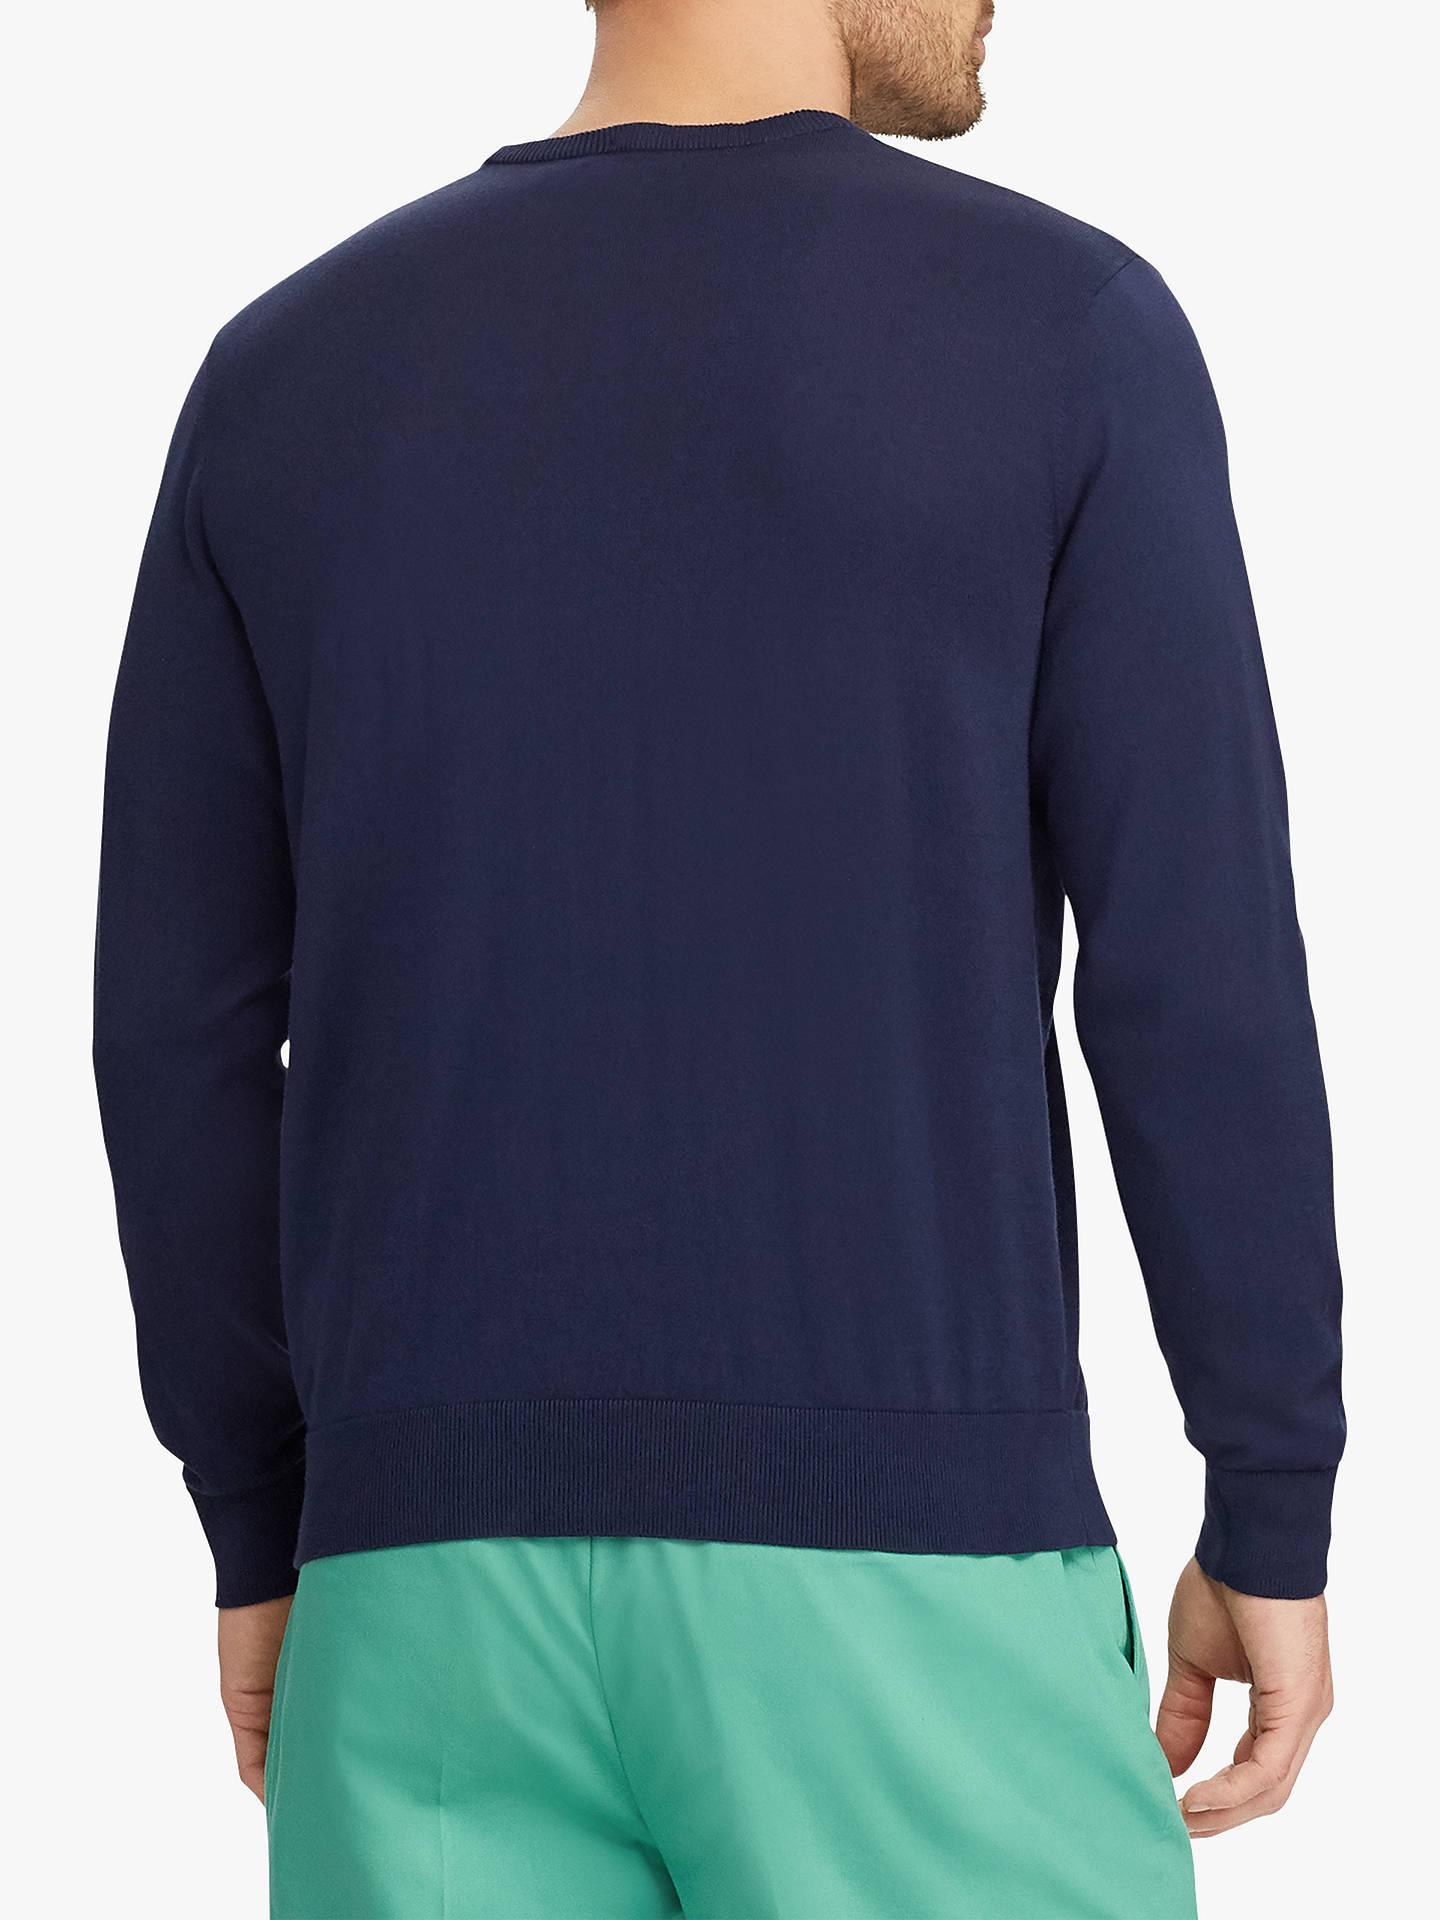 b5f4bce44 ... Buy Polo Golf by Ralph Lauren Crew Neck Jumper